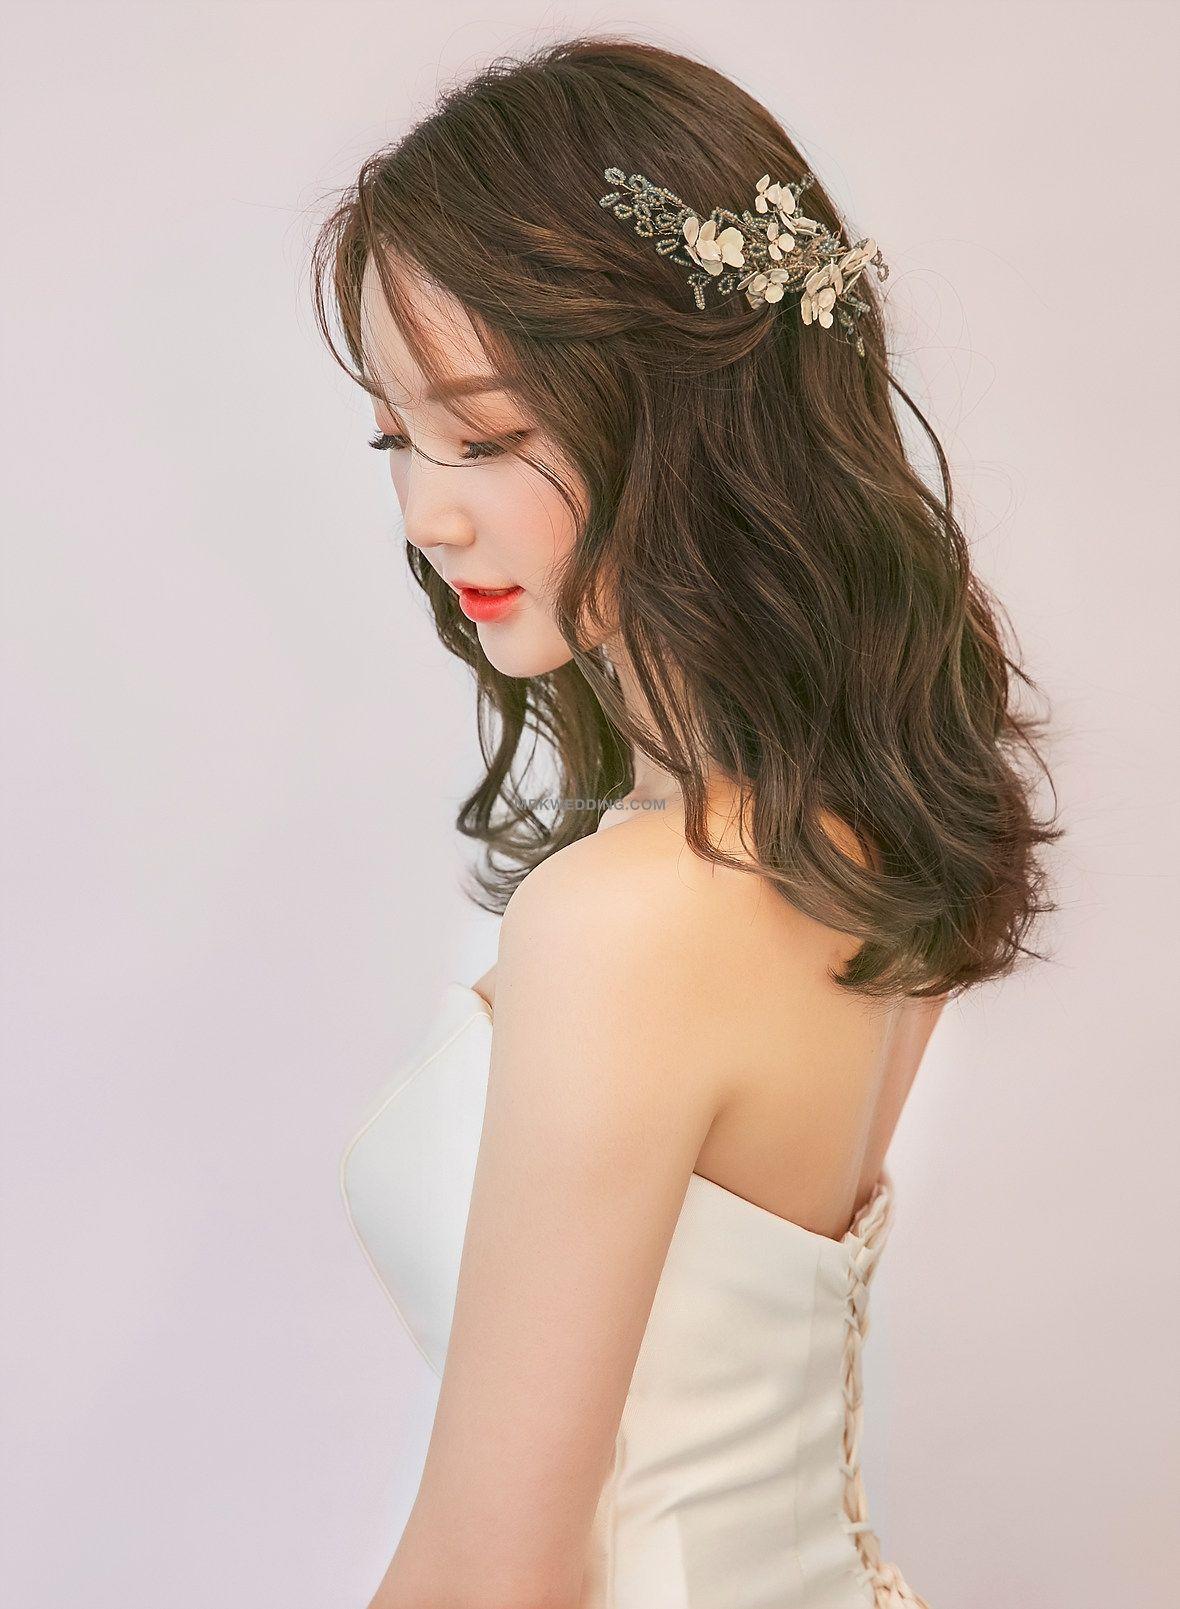 Korea Famous Beauty Salon Culture And Nature 2019 Wedding Package Mr K Korea Pre Wedding Every Asian Bridal Hair Asian Wedding Hair Korean Wedding Hair